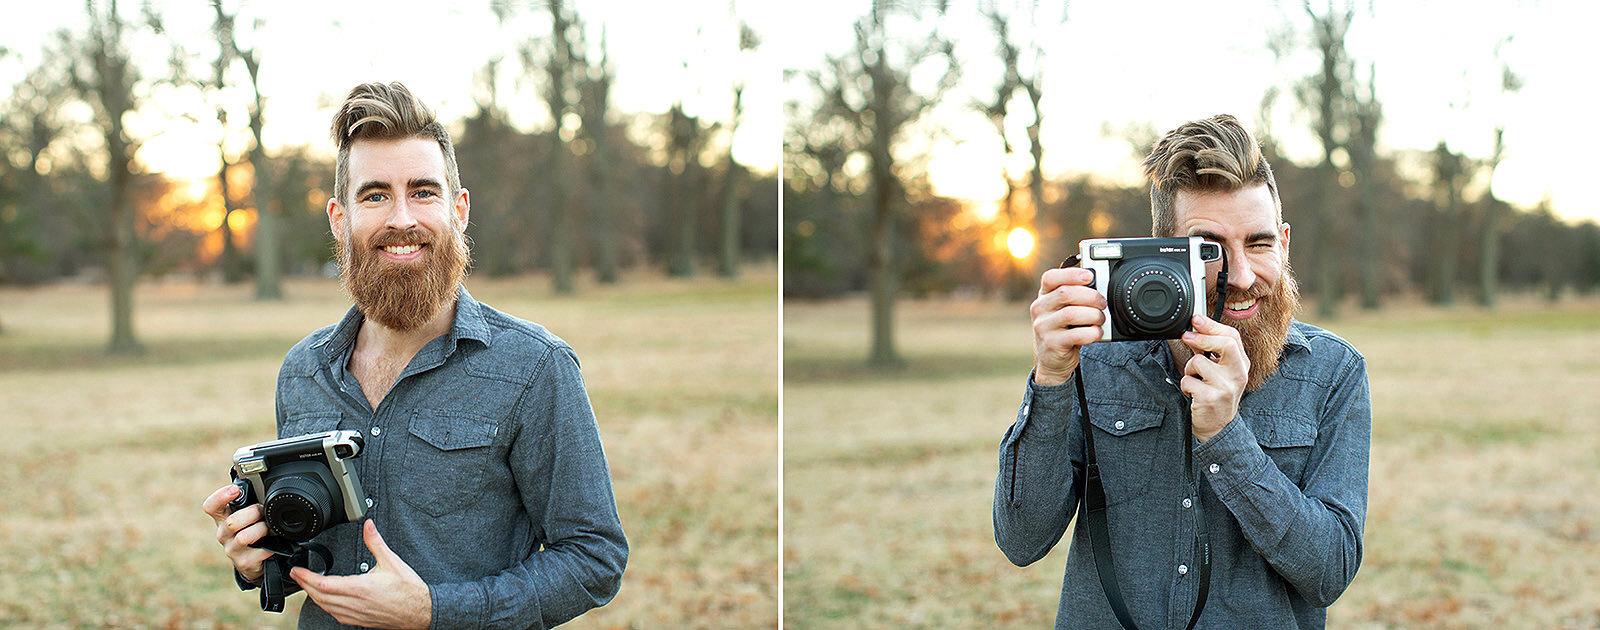 jeremy-working-polaroid-camera-photojournalism-wedding.jpg